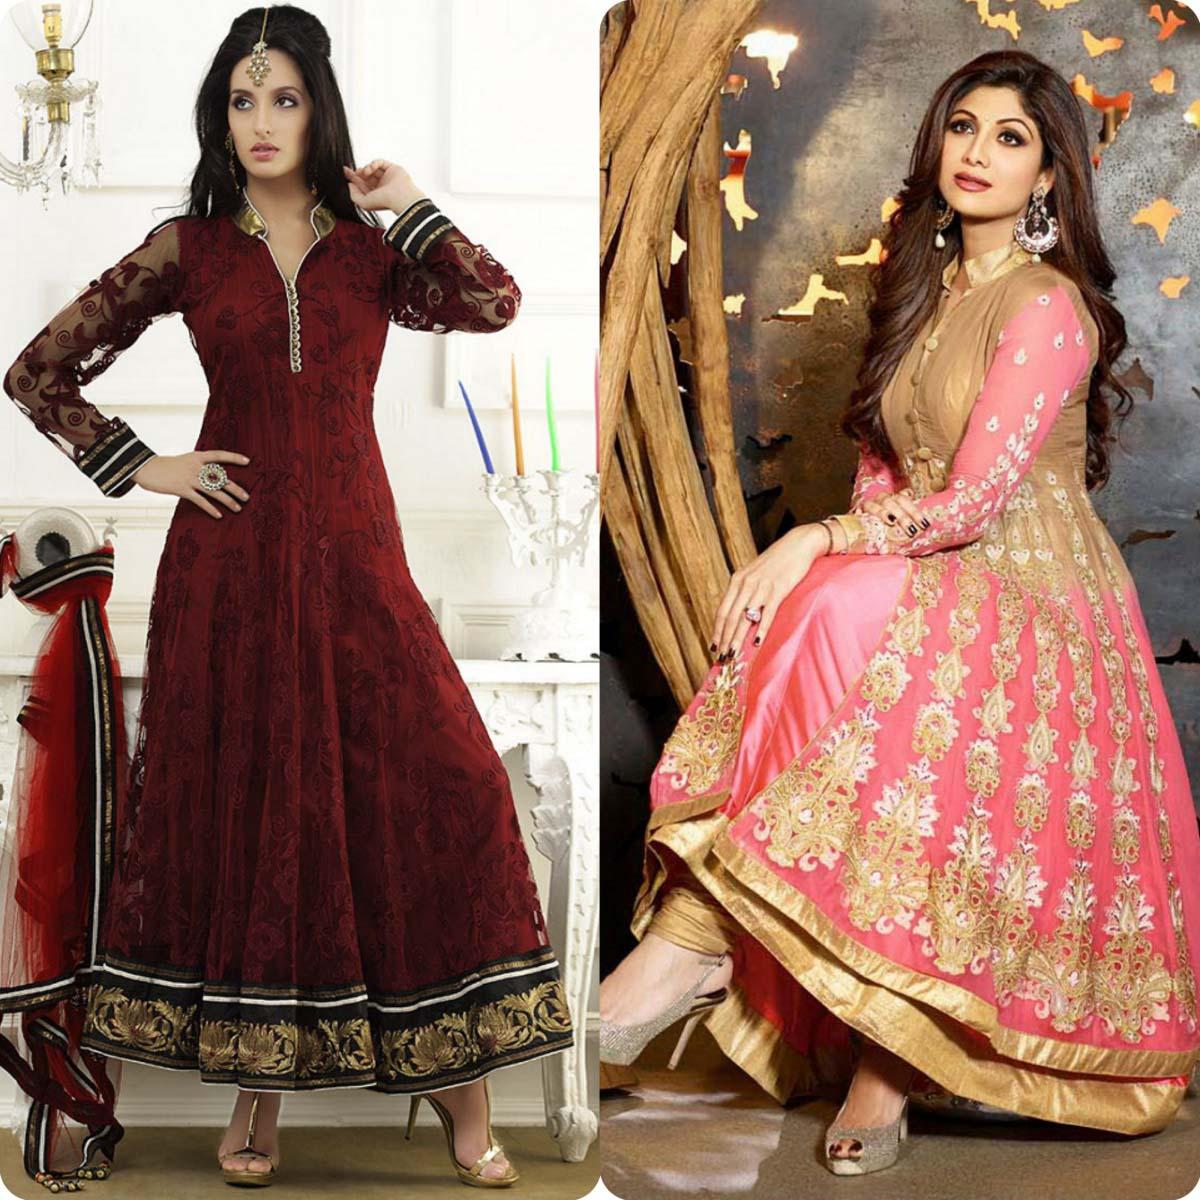 Indian Stylish Umbrella Frock and Churidar Dresses for Girls 2016-2017 (5)